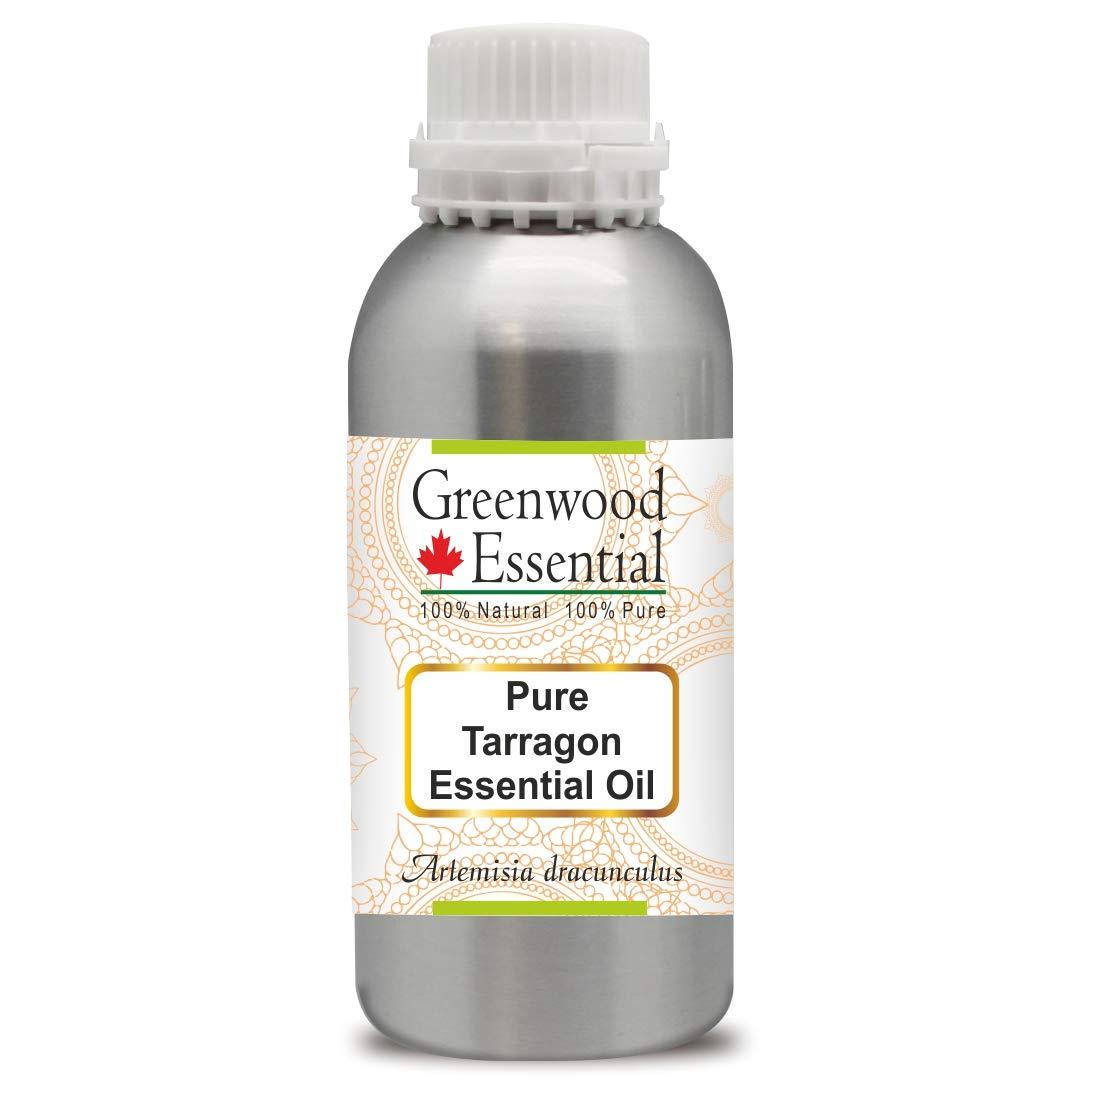 Greenwood Essential Tarragon Essential Oil (Artemisia dracunculus) 100% Natural Therapeutic Grade Steam Distilled 1250ml (42.2 oz)